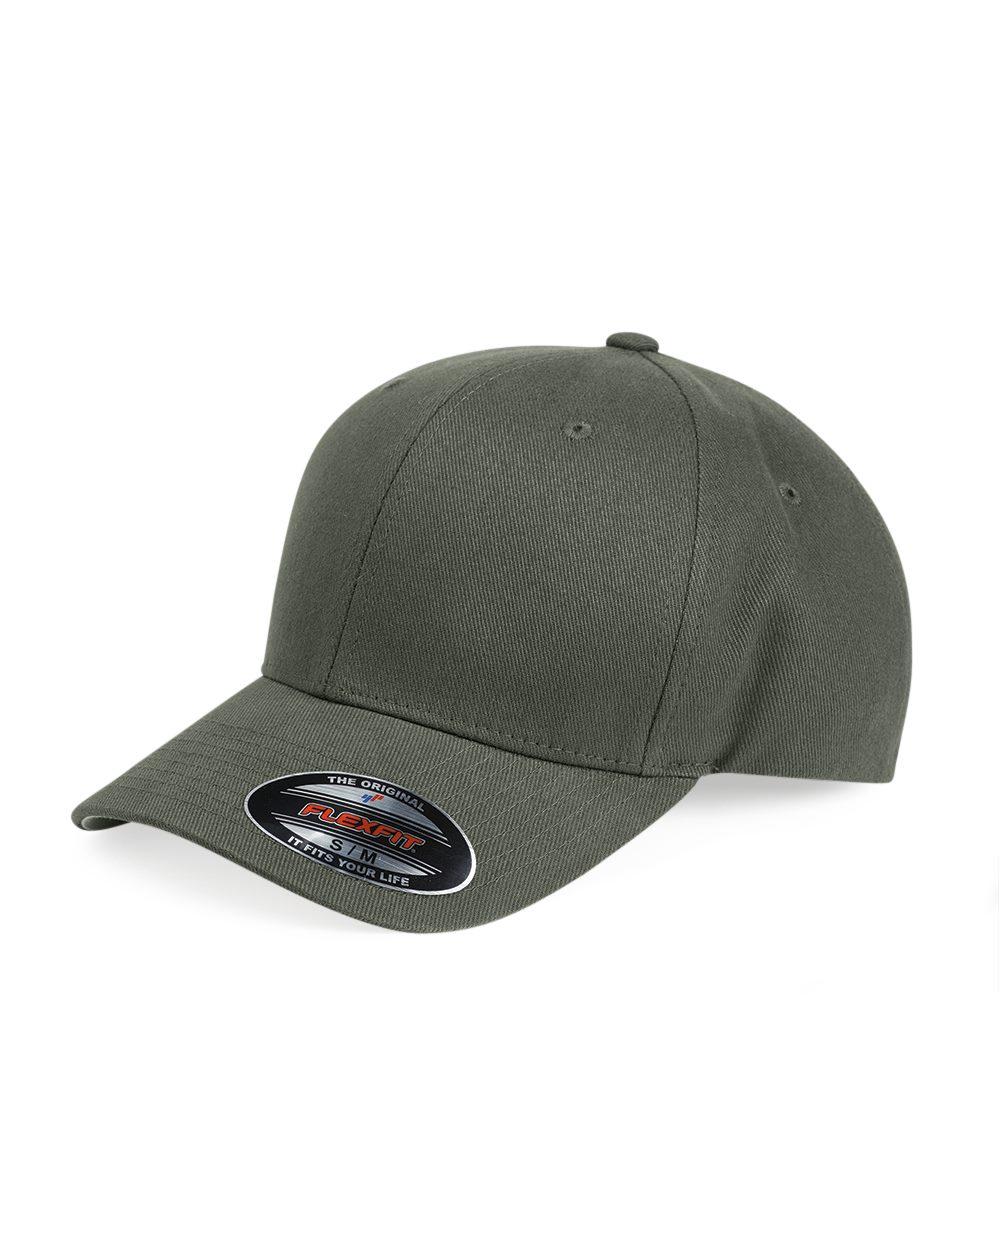 Flexfit 6377 Structured Brushed Twill Cap